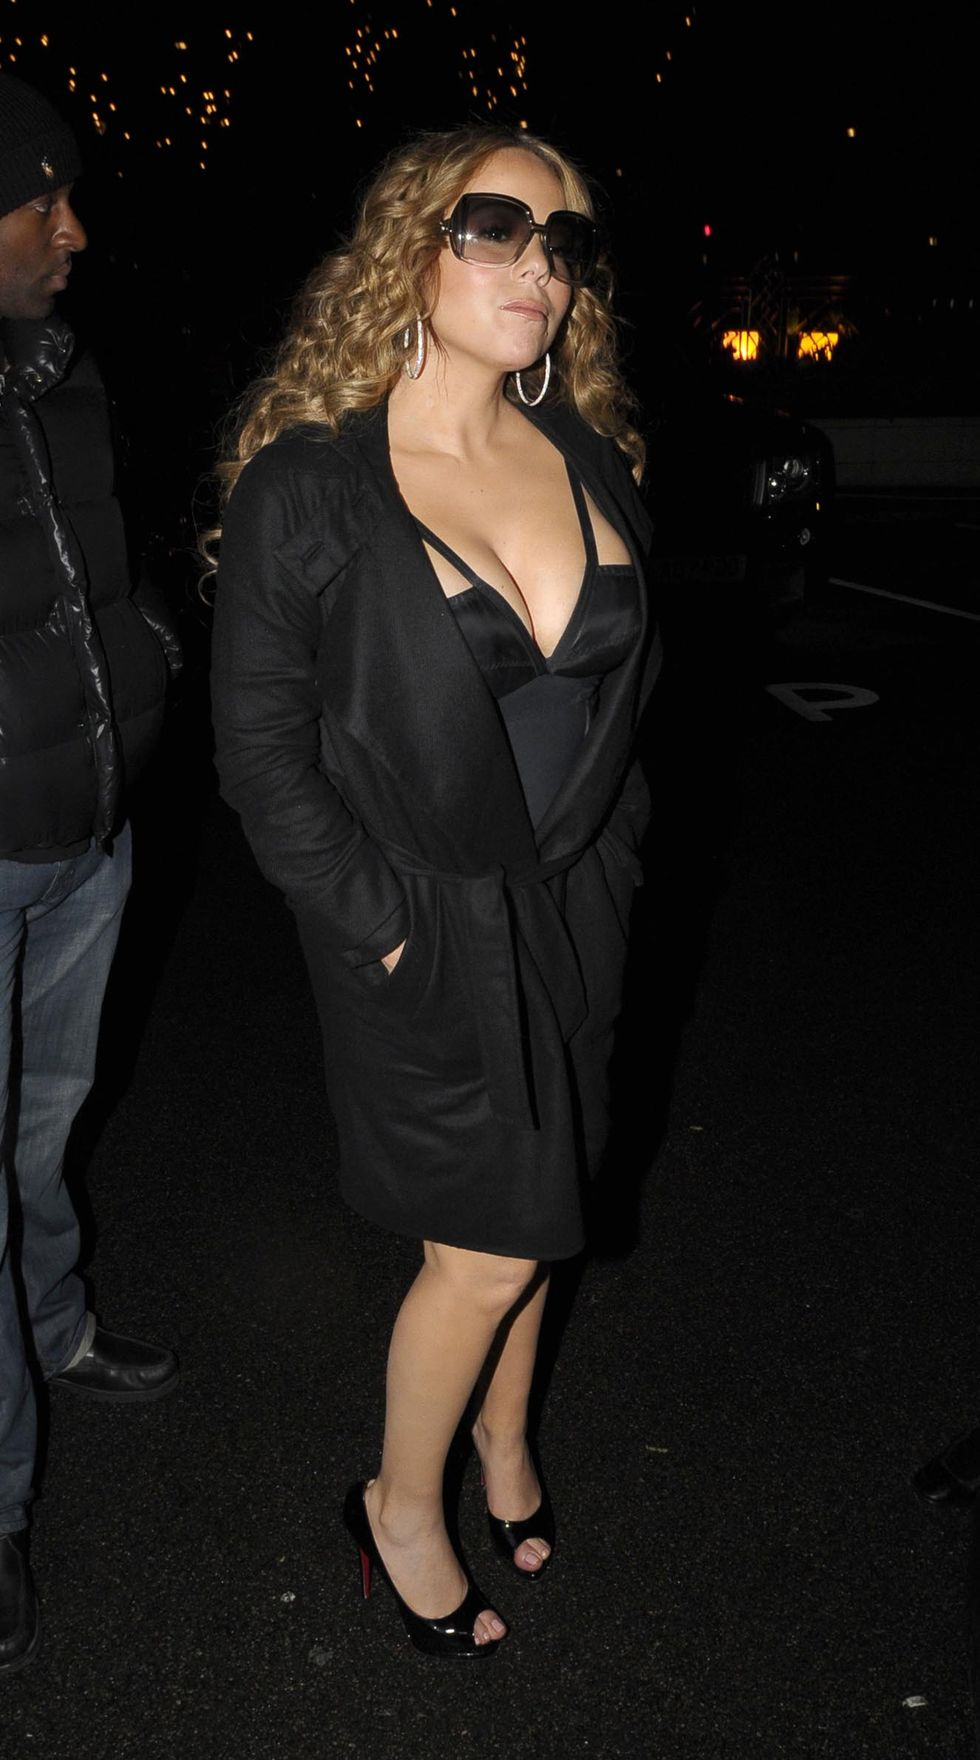 mariah-carey-cleavage-candids-in-london-01